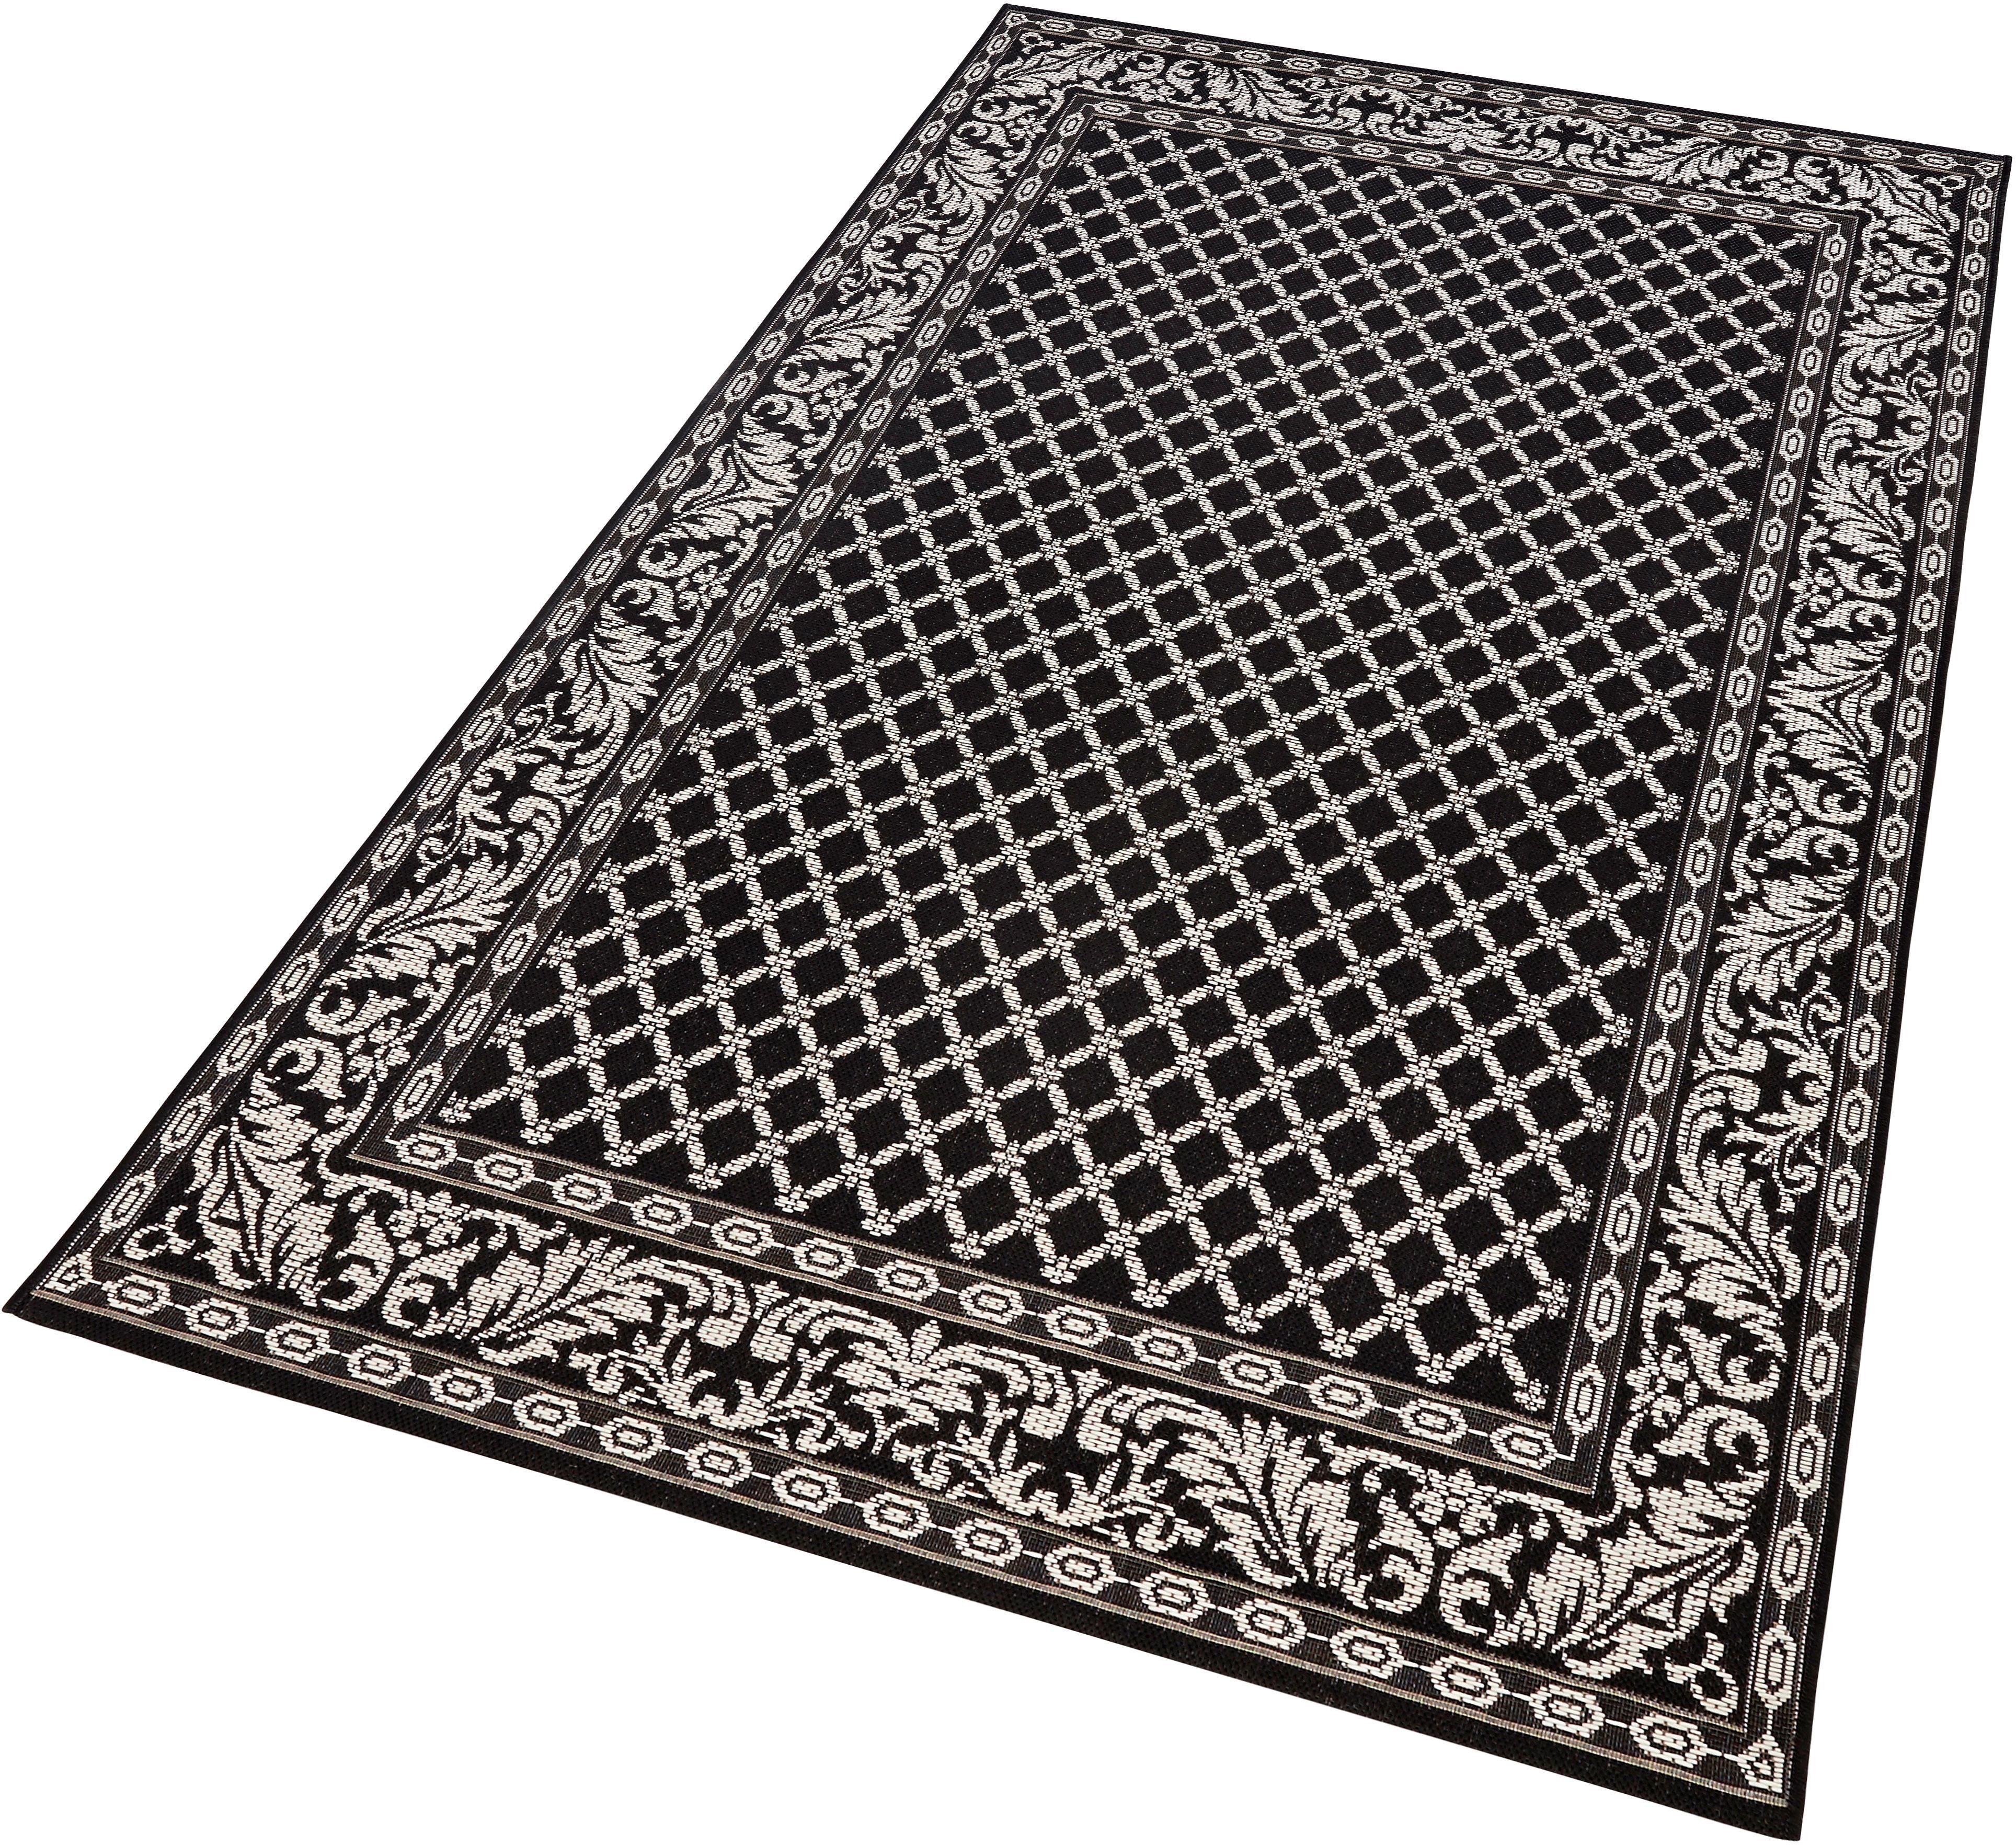 Teppich Royal bougari rechteckig Höhe 4 mm